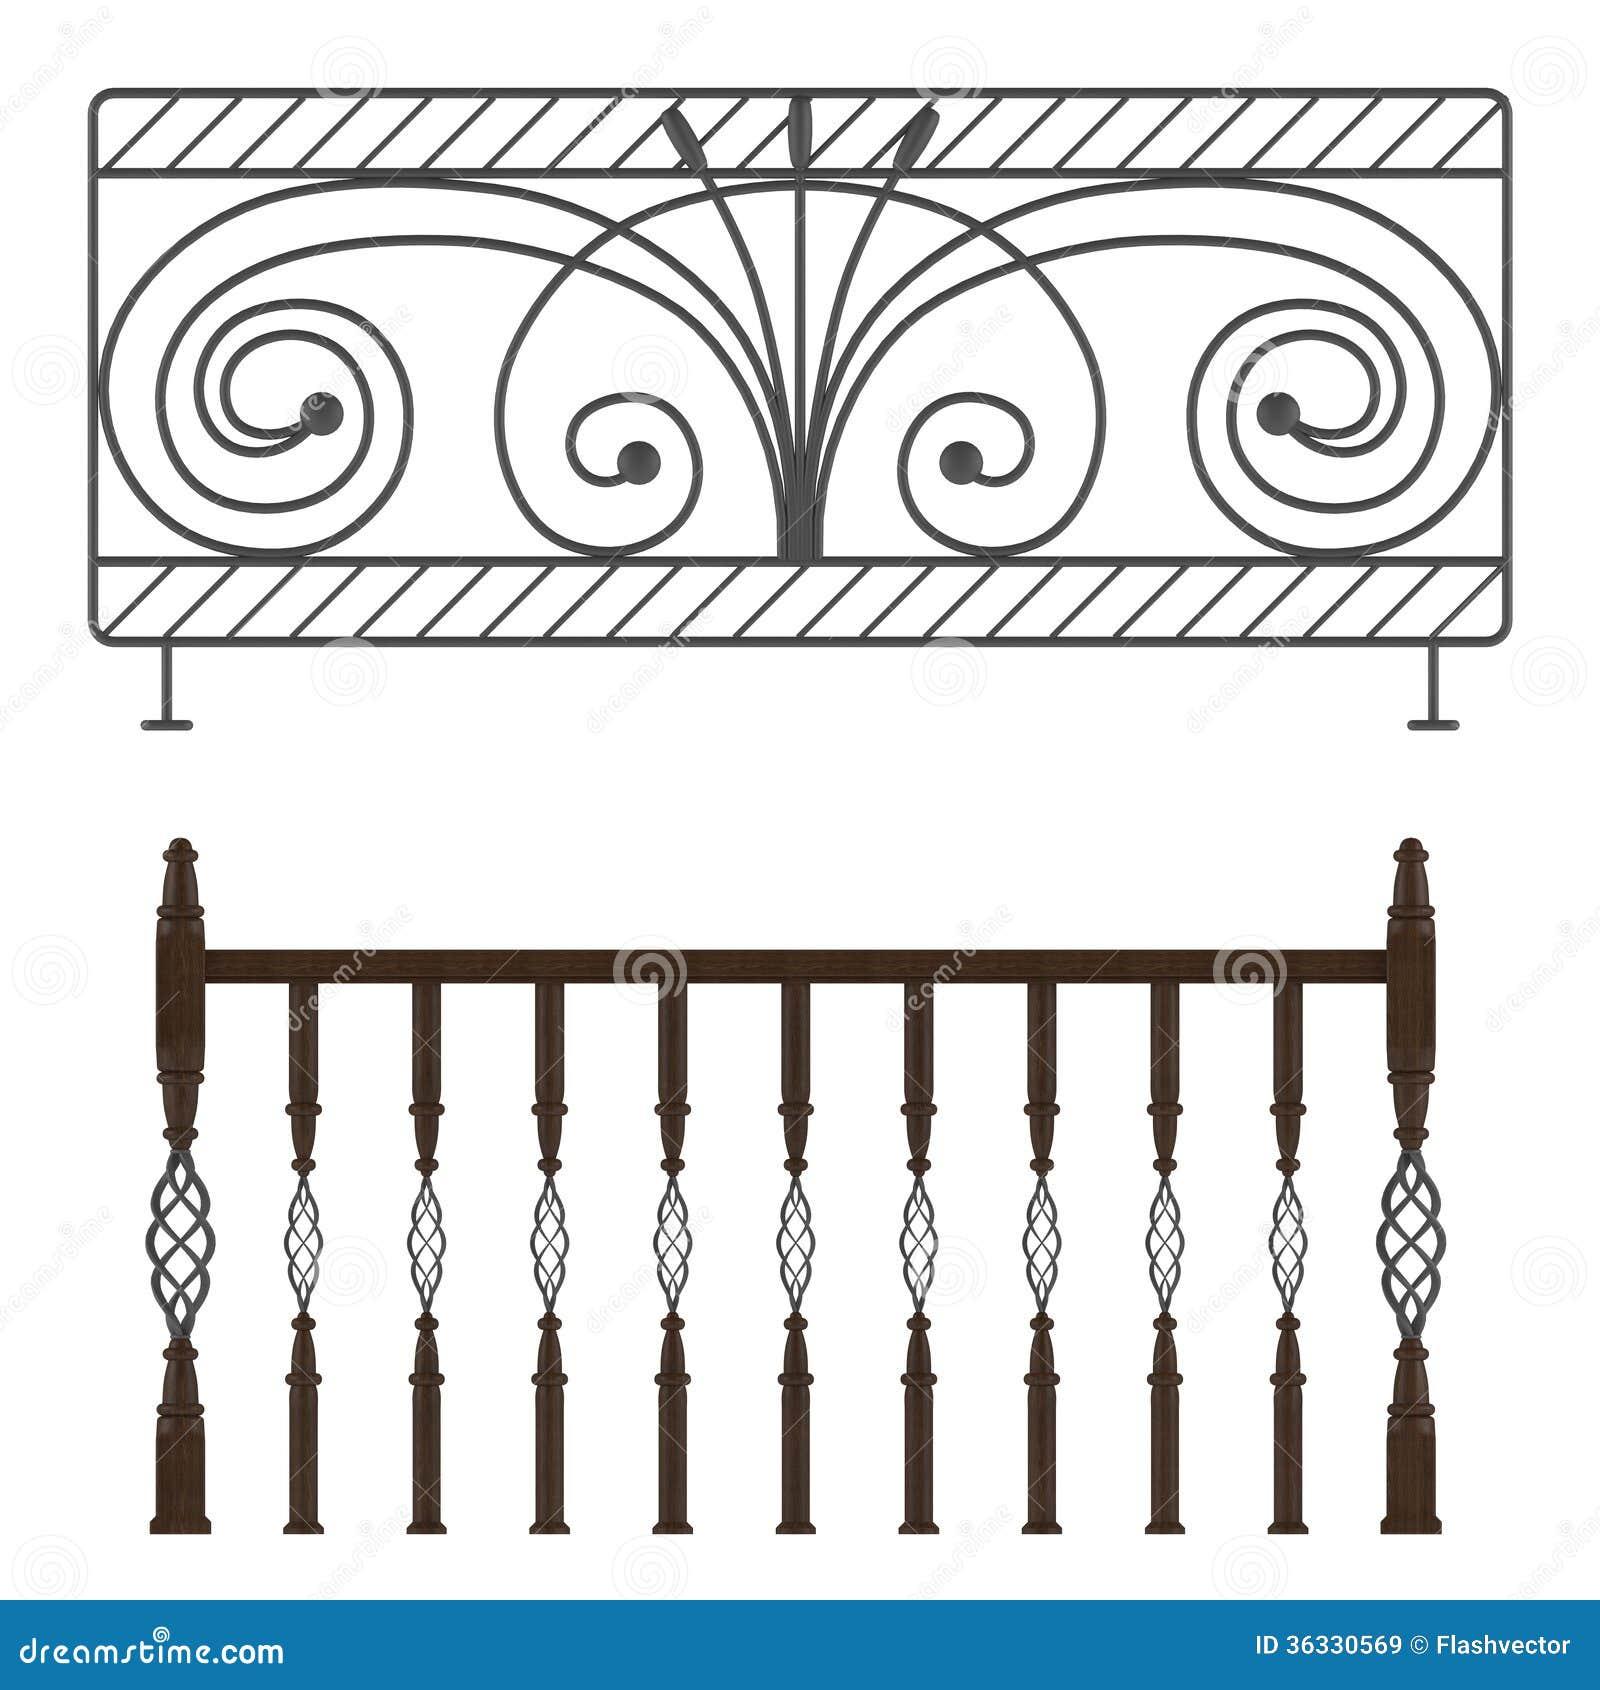 Wrought iron railings stock illustration image of work - Verjas de hierro ...